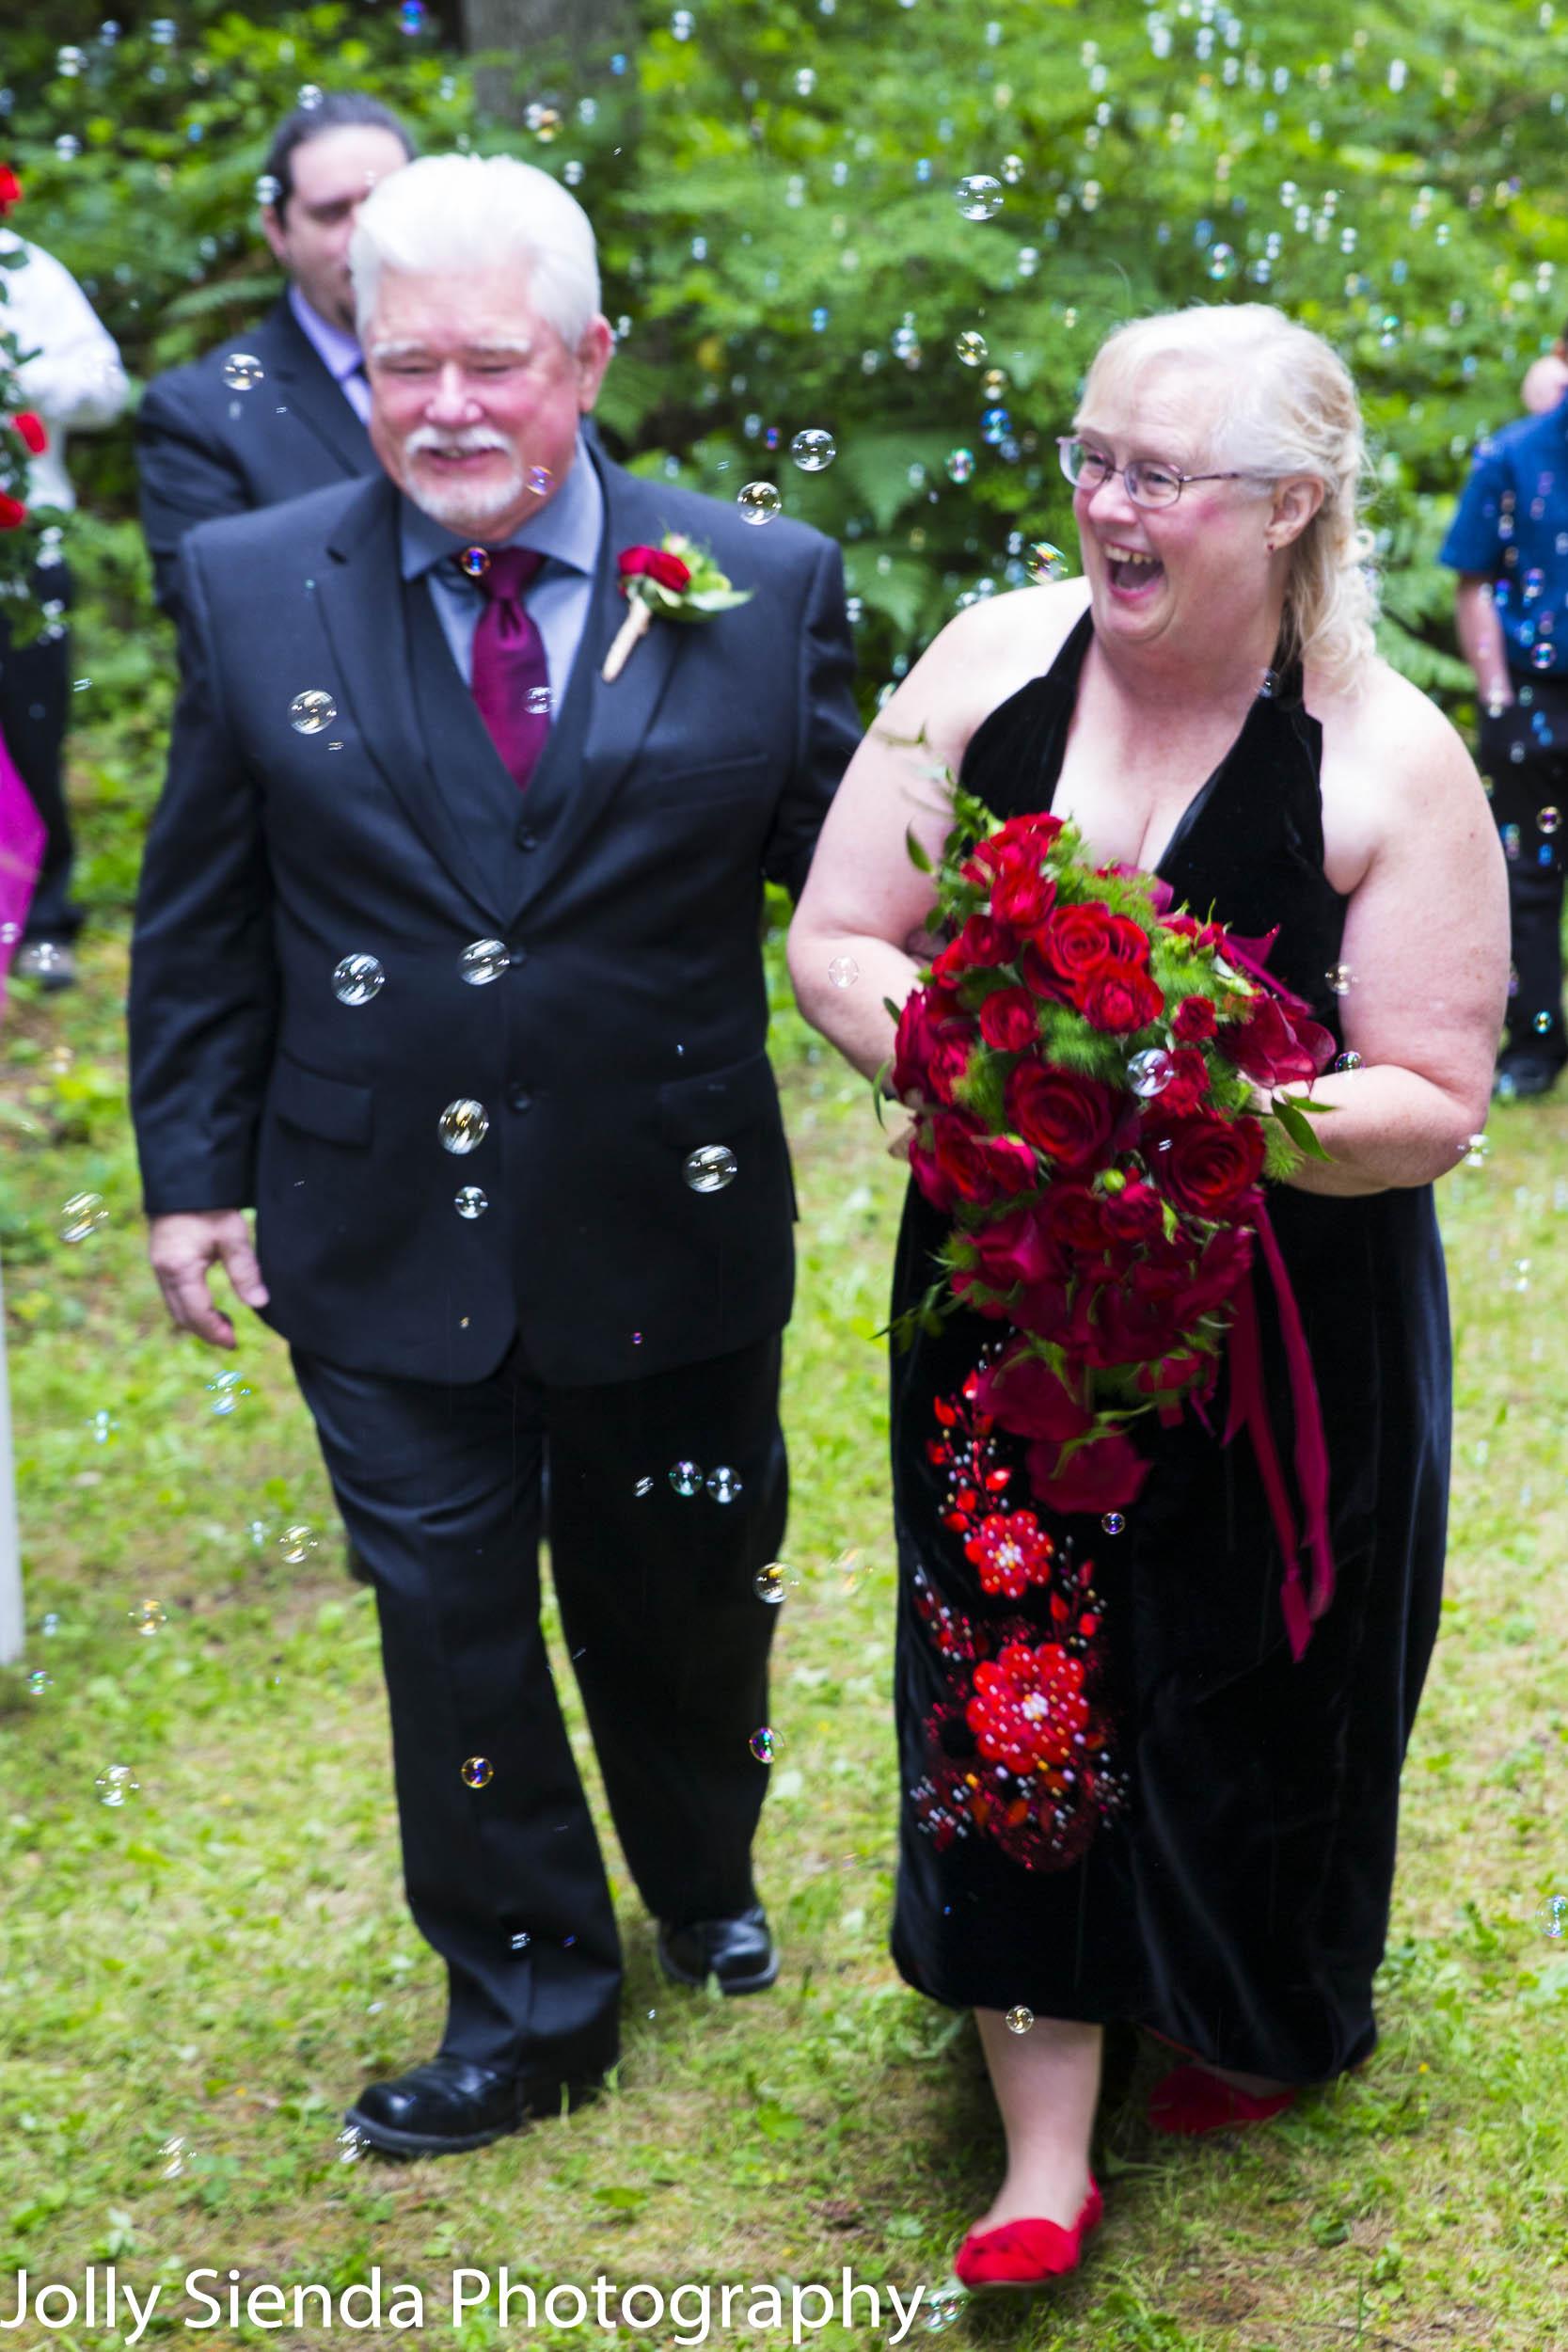 Myrna Leage and Ralph Runkle Wedding